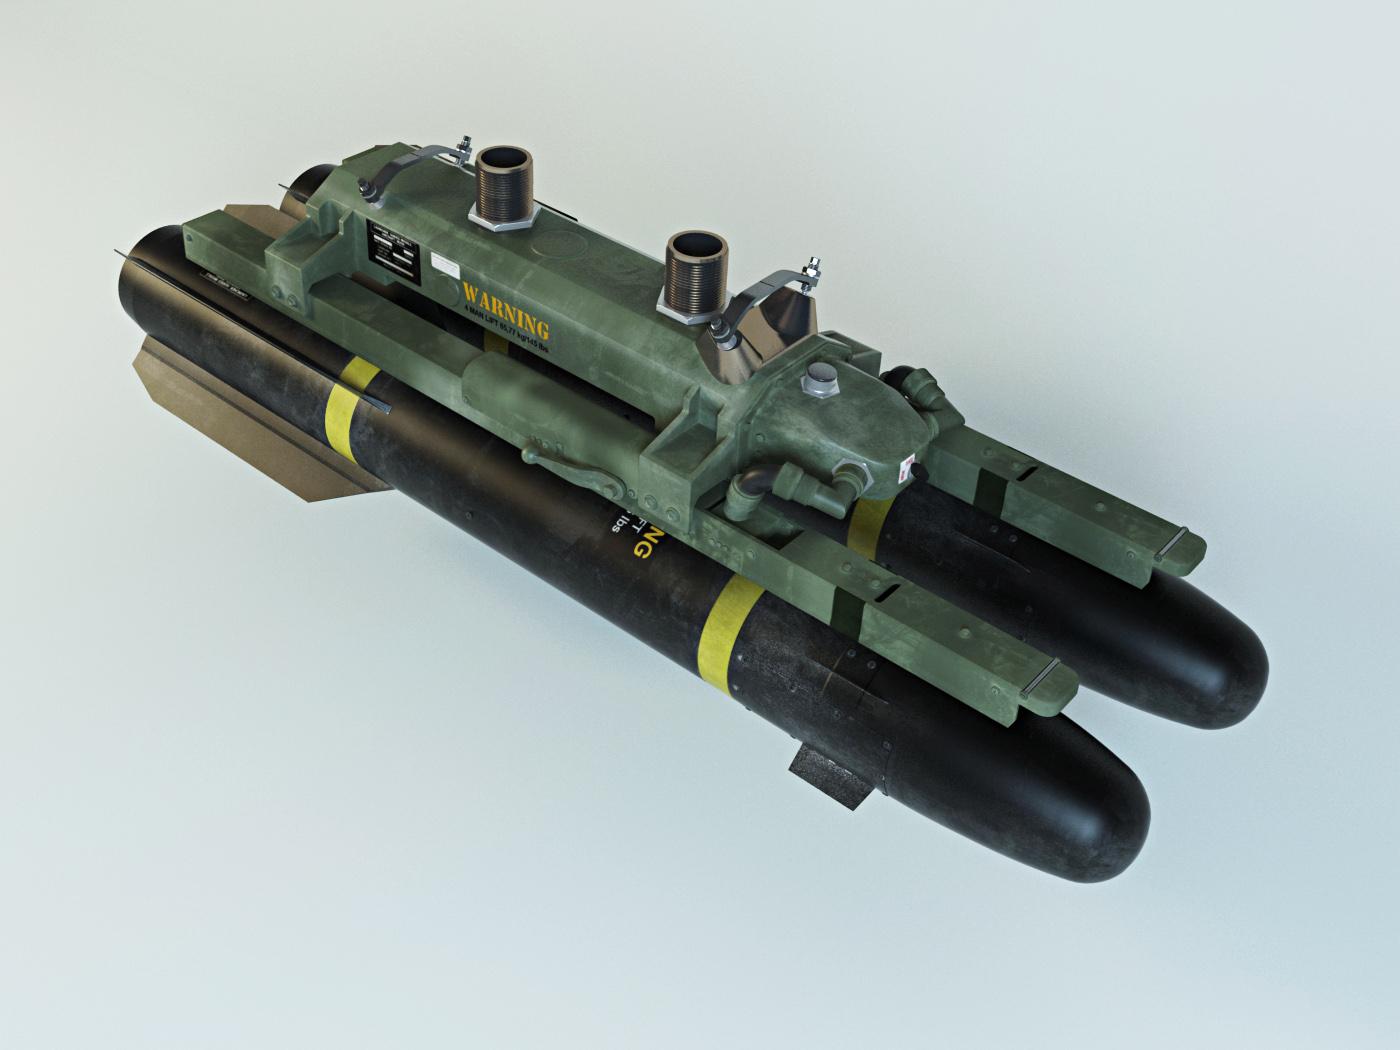 Longbow AGM-114L Hellfire